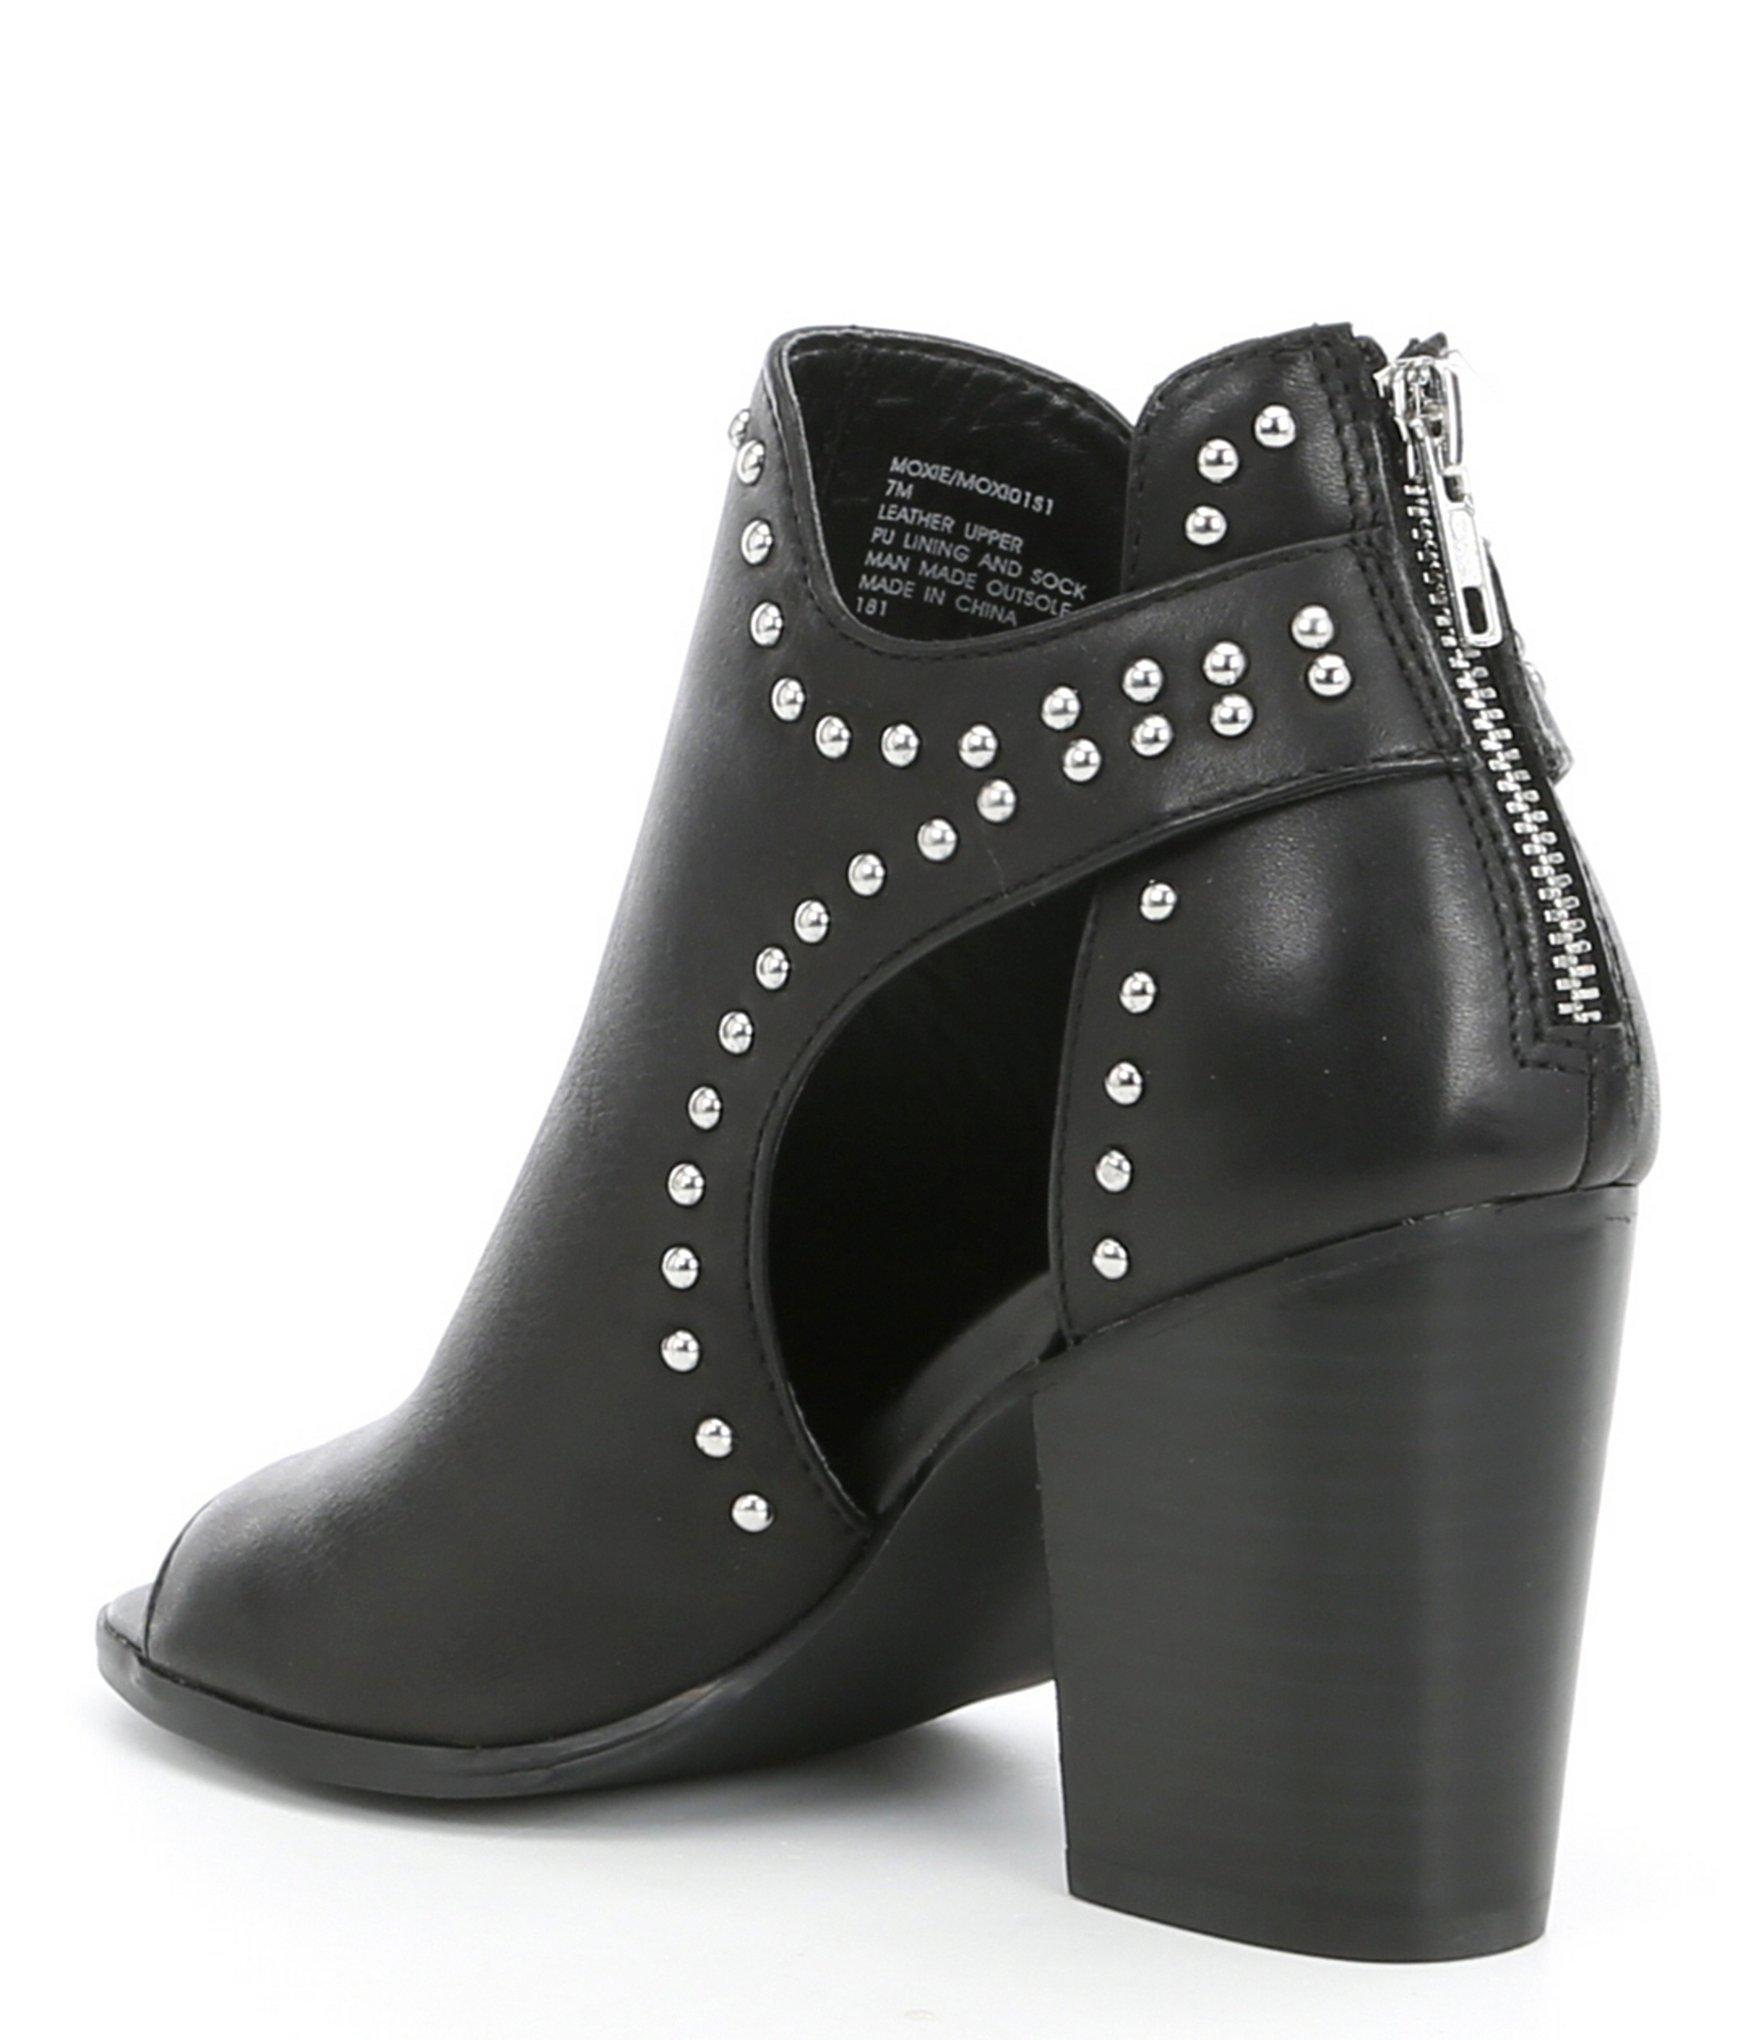 Fashion Steve Madden Rikter Cognac Leather Knee High Heel